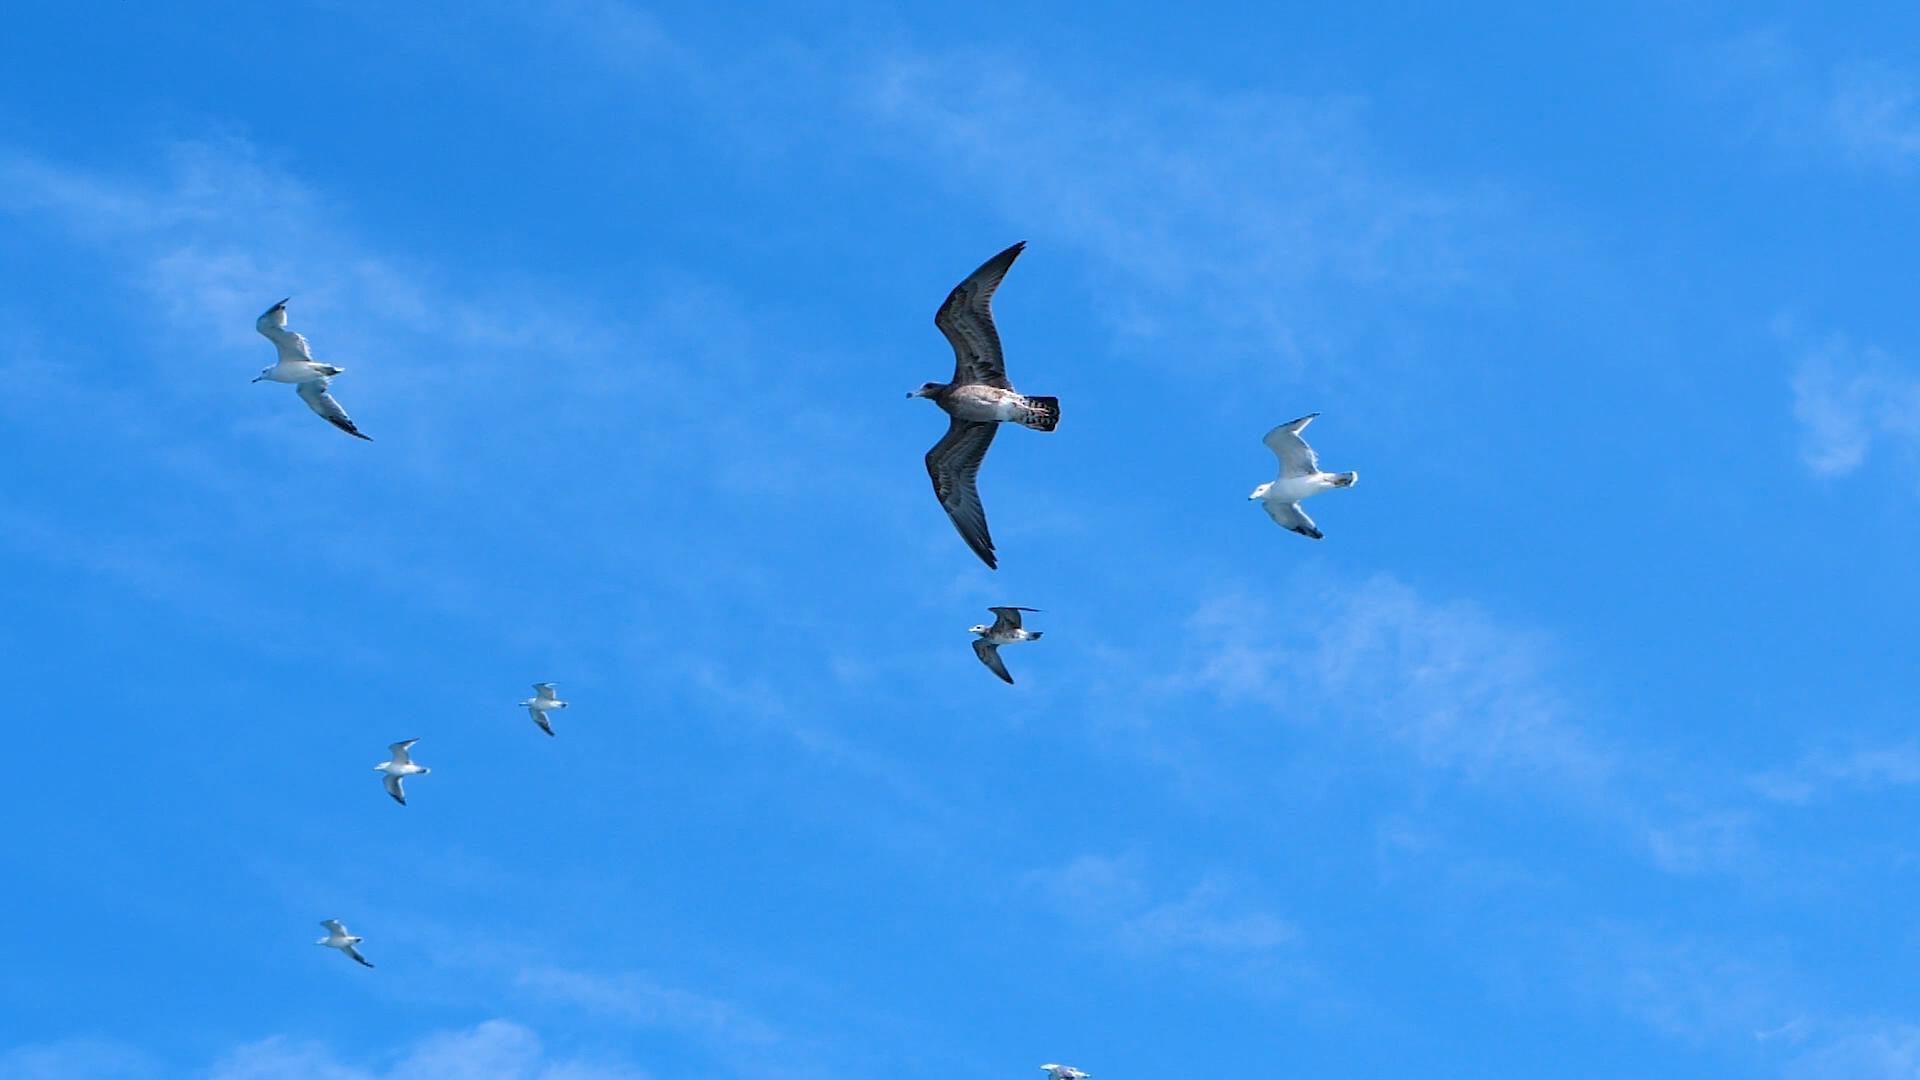 1080P升格拍攝海上海鷗